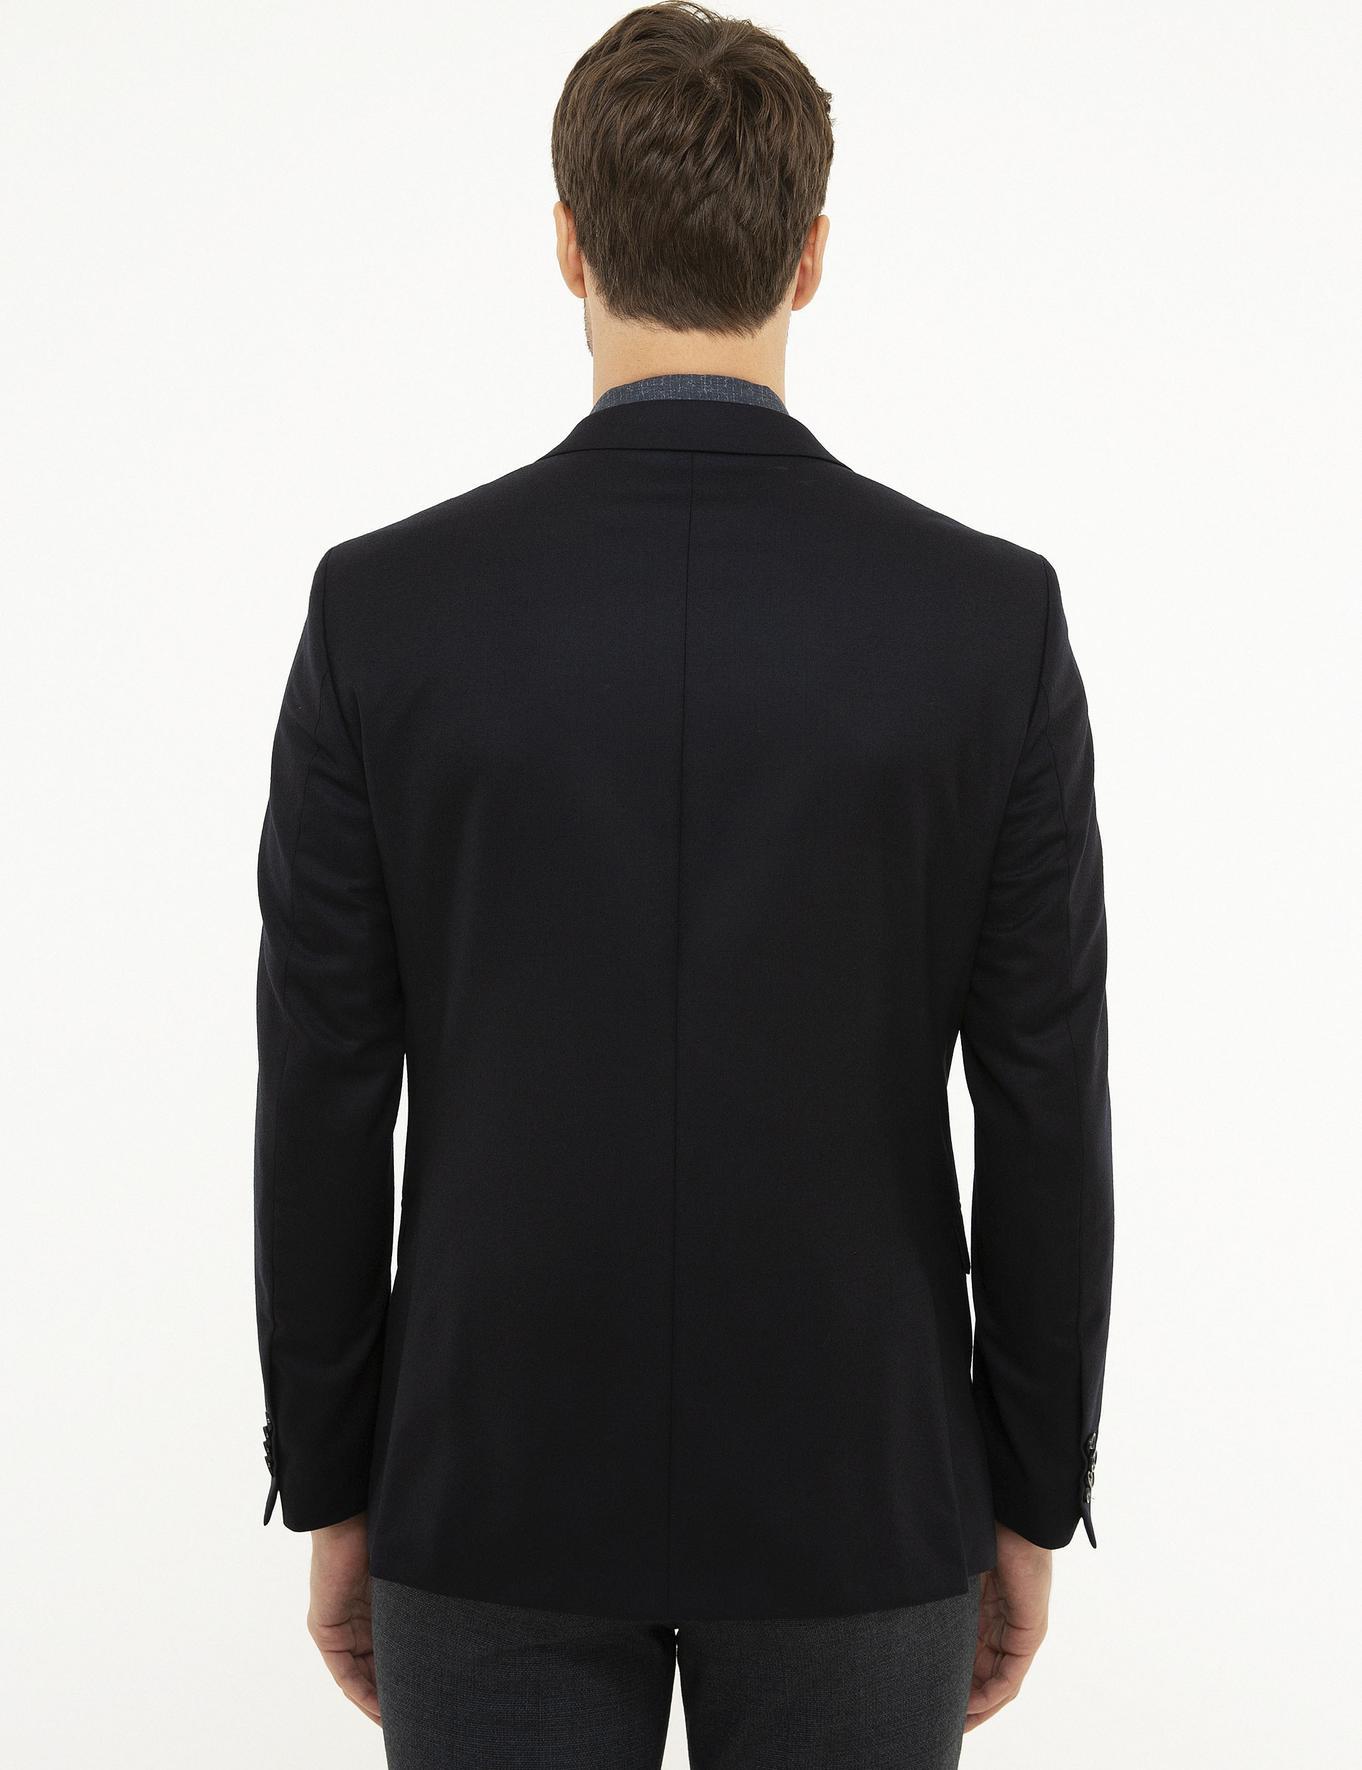 Lacivert Slim Fit Ceket - 50209707252